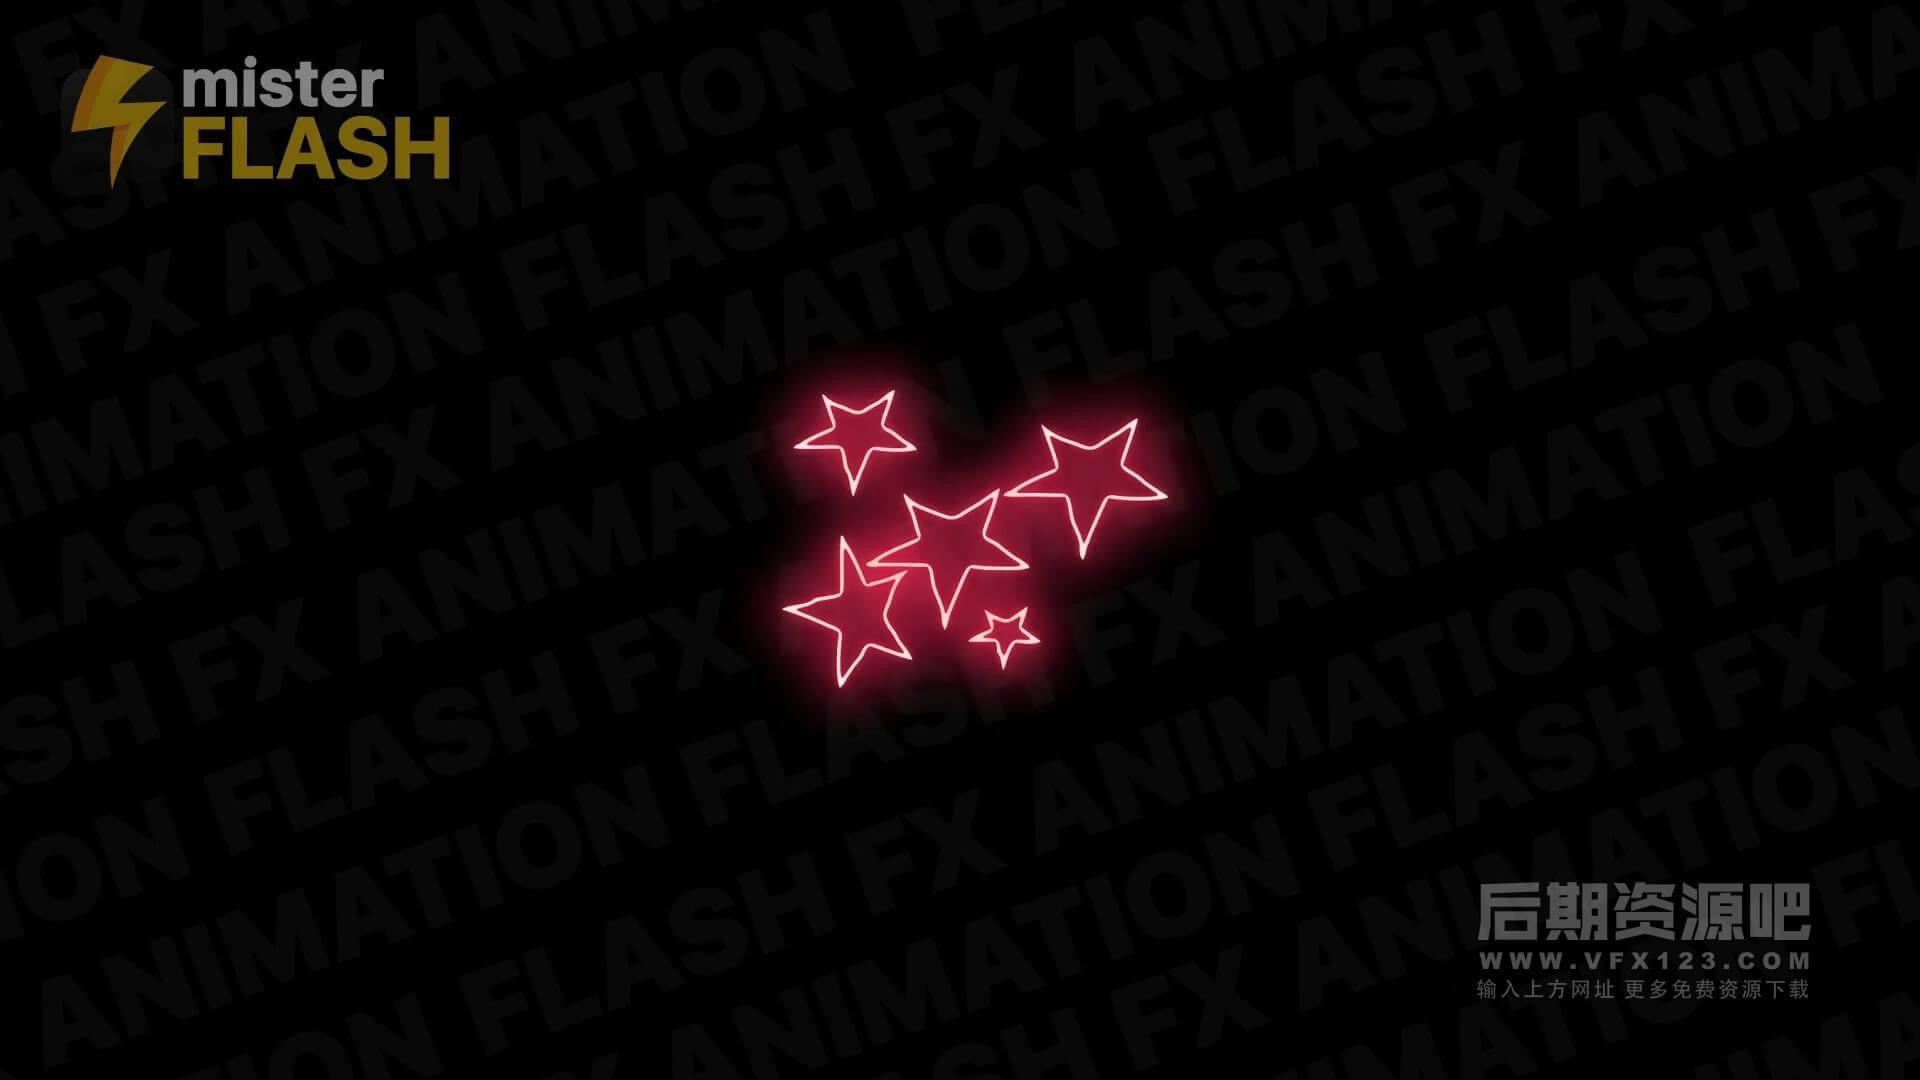 FCPX插件 霓虹灯发光手绘闪烁效果动画元素 第二季 Neon Generators